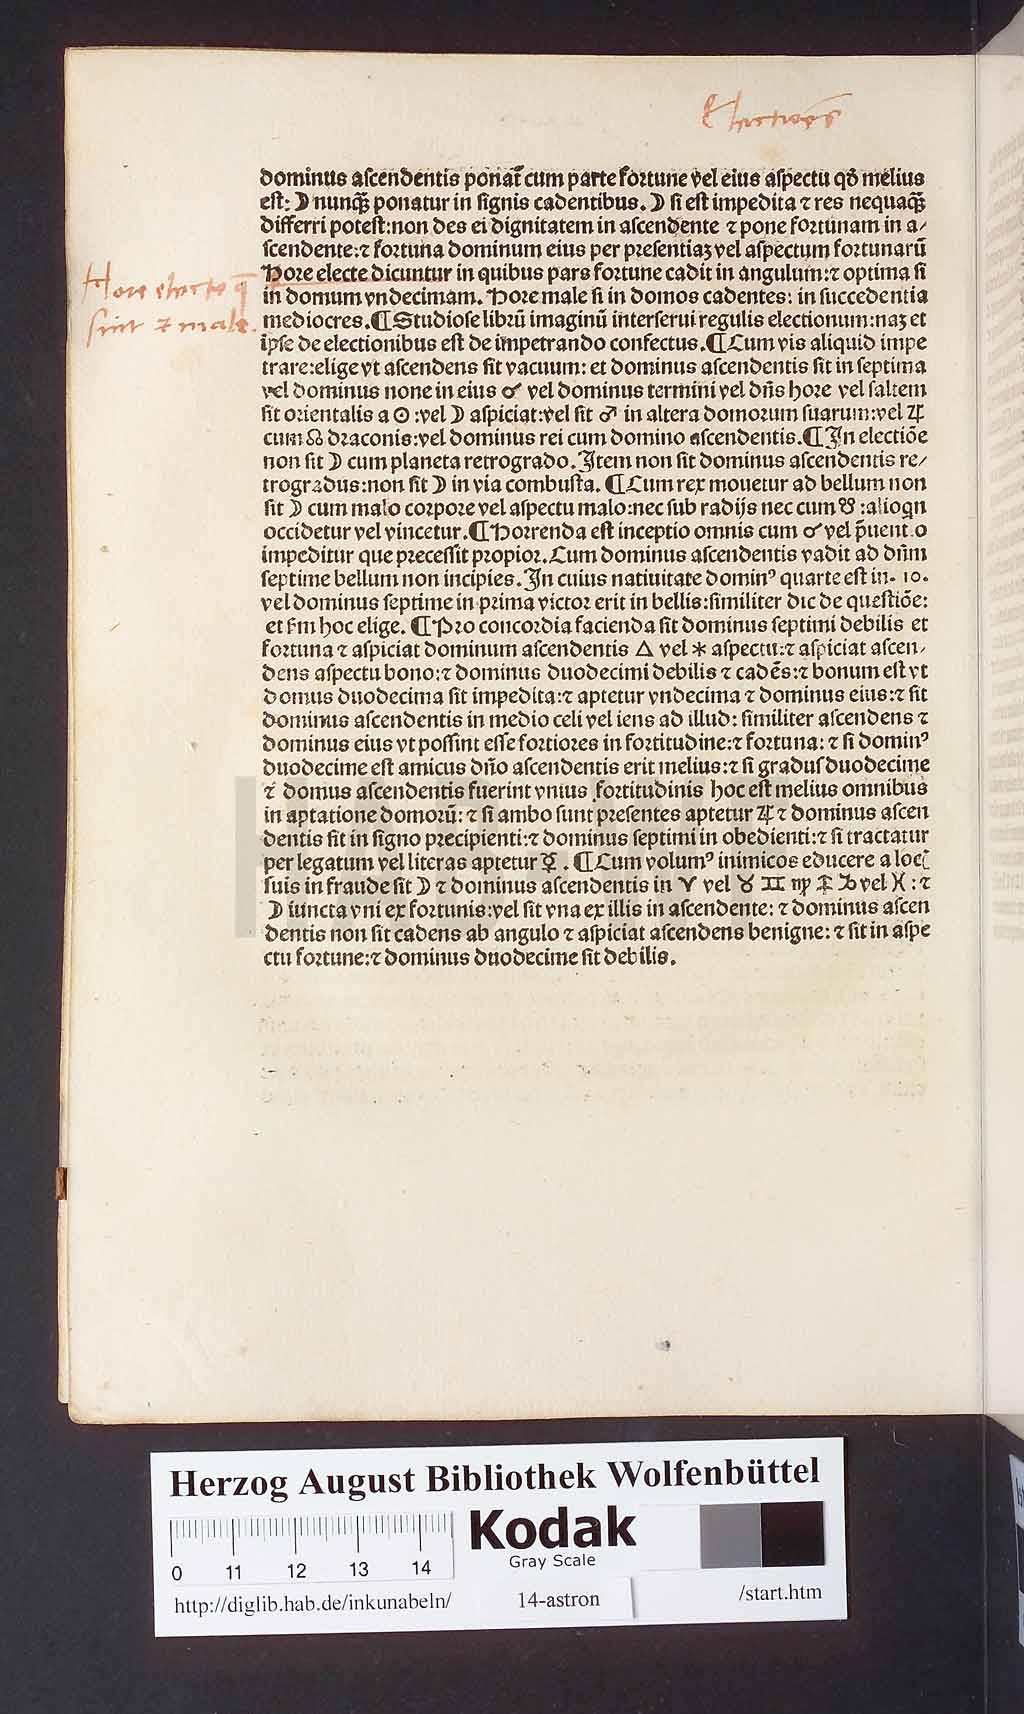 http://diglib.hab.de/inkunabeln/14-astron/00208.jpg